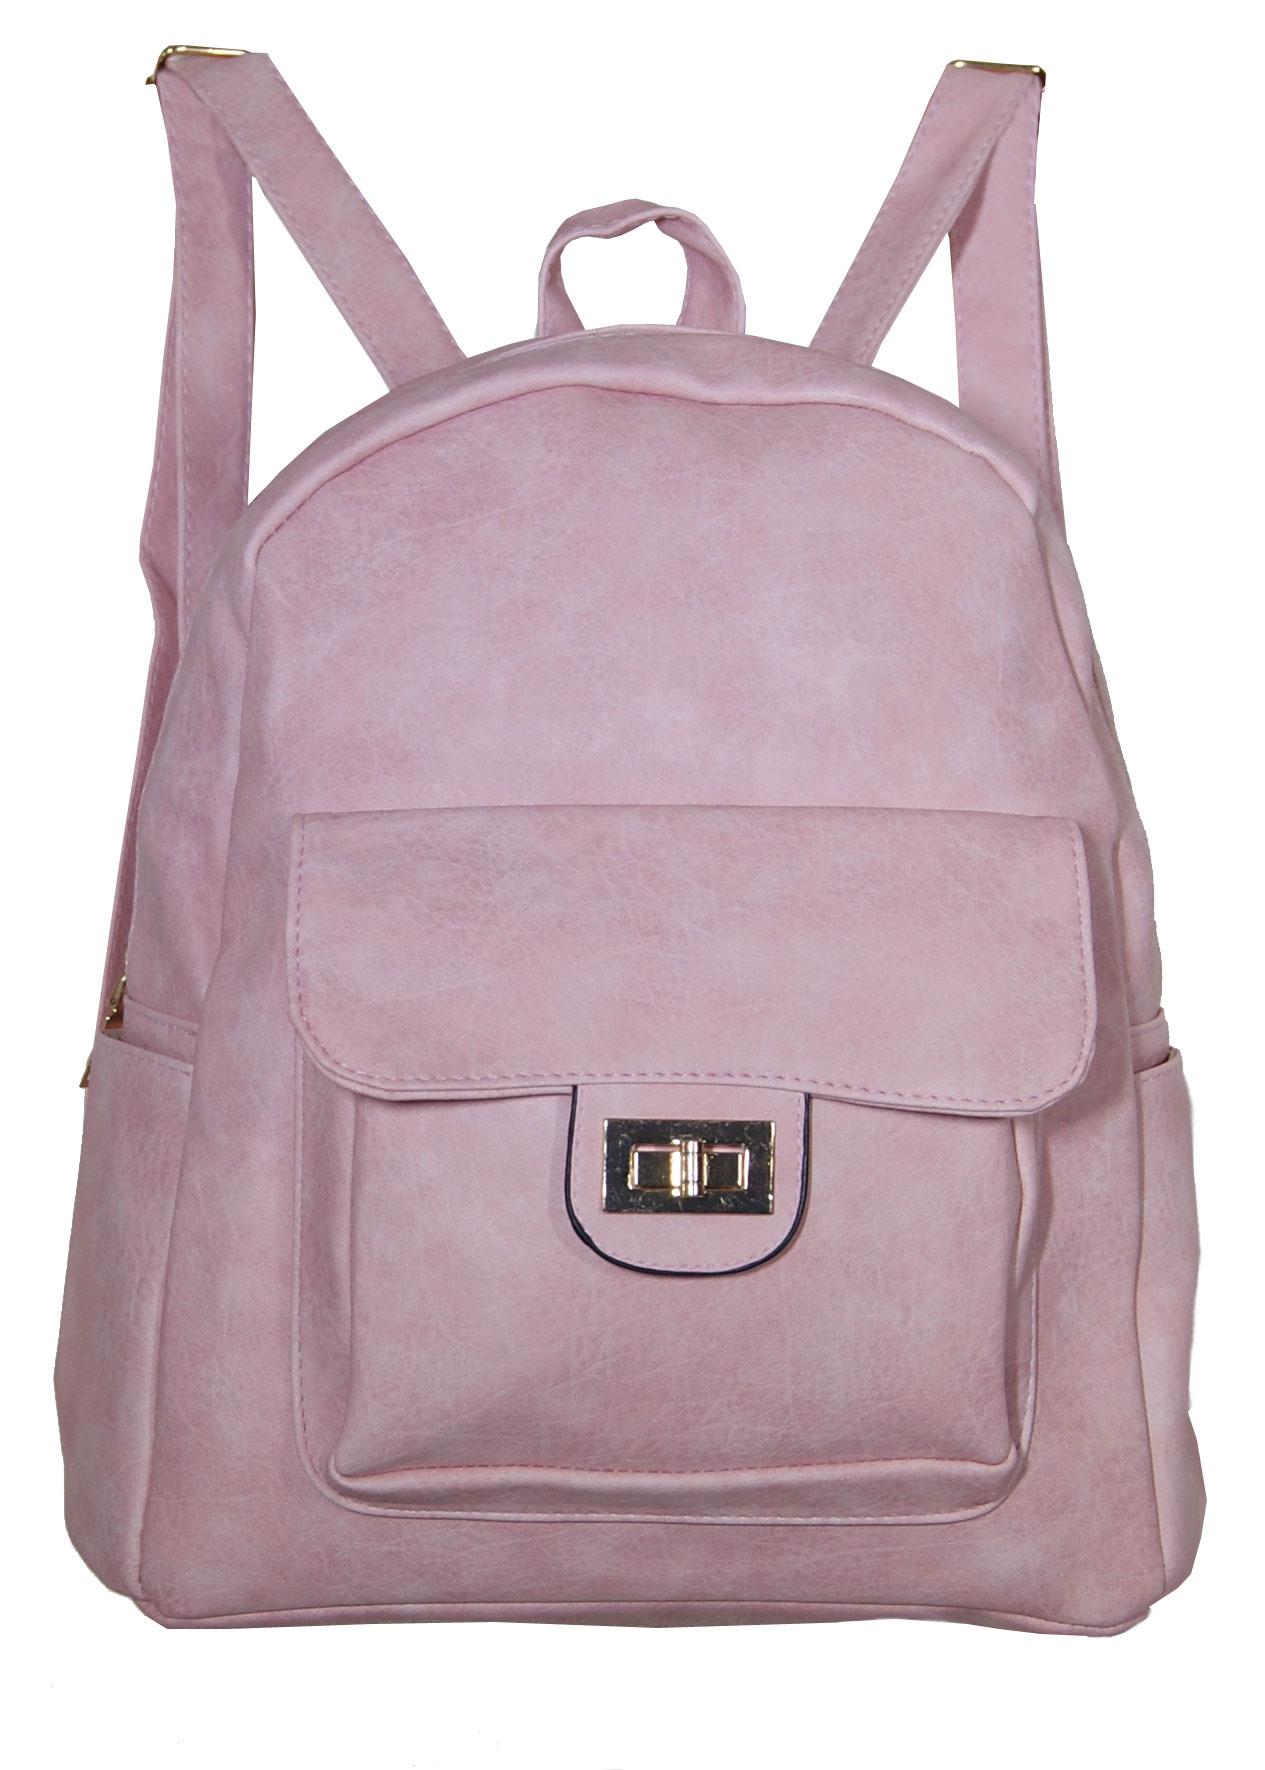 Backpack No 8590 - Ροζ (Silvio κωδ.: 8590)